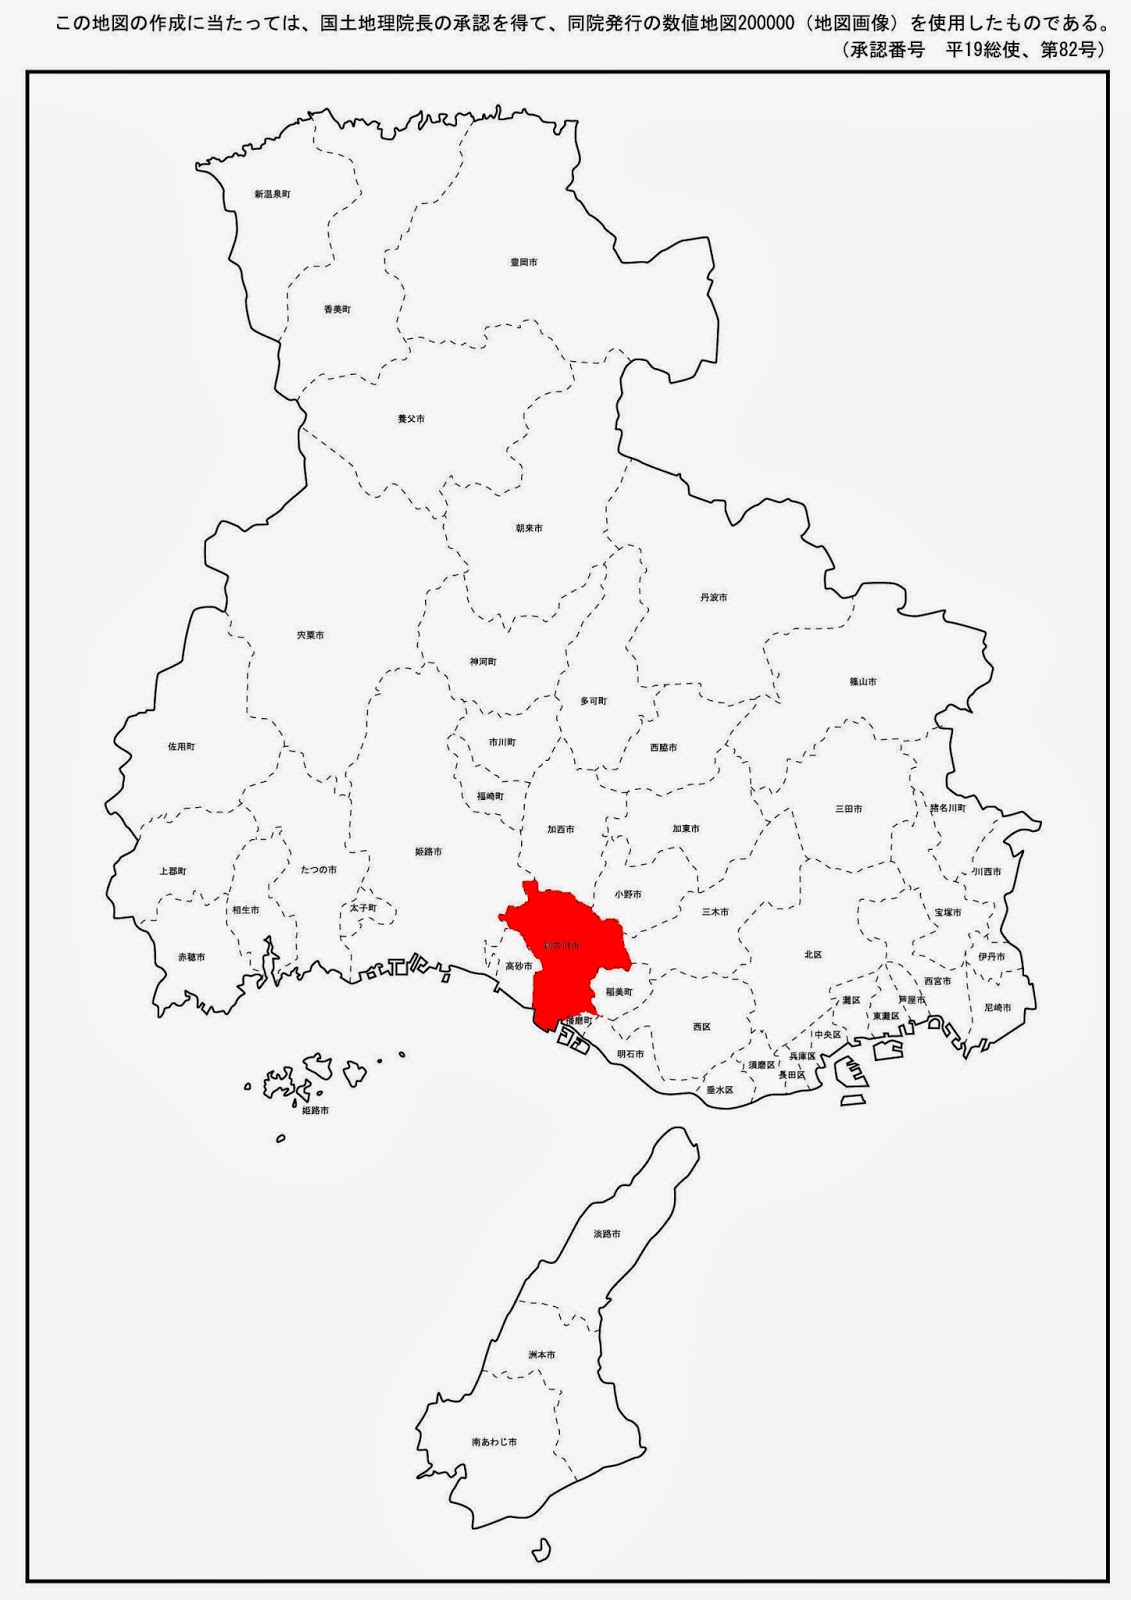 dryascw: ファースト加古川市 (JCC2711) JA3EA,JR3LPH